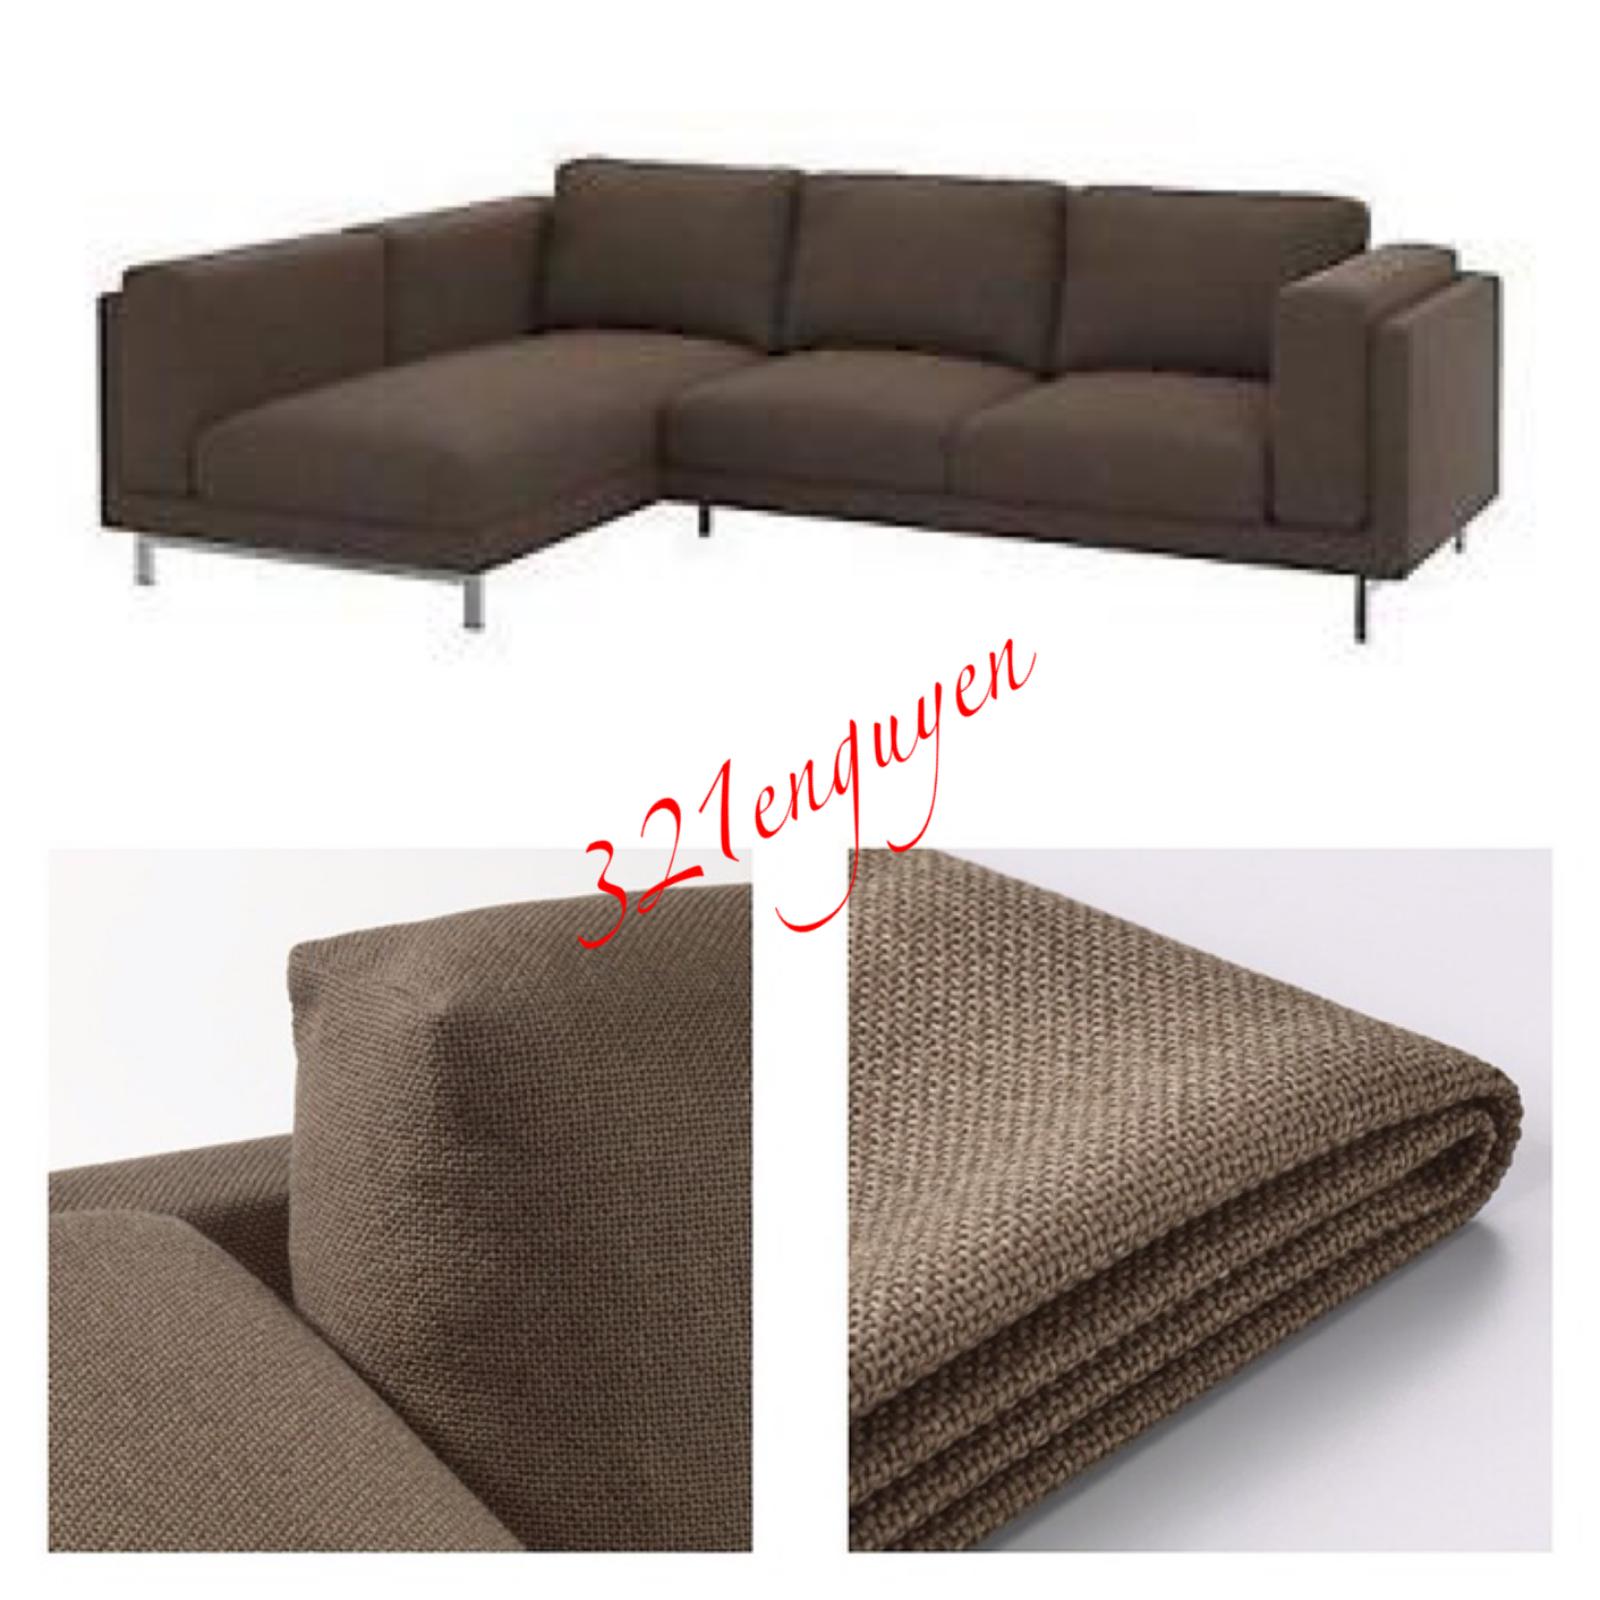 Excellent Ikea Nockeby 3 Seat Sofa W Left Chase Slipcover Cover Teno Inzonedesignstudio Interior Chair Design Inzonedesignstudiocom